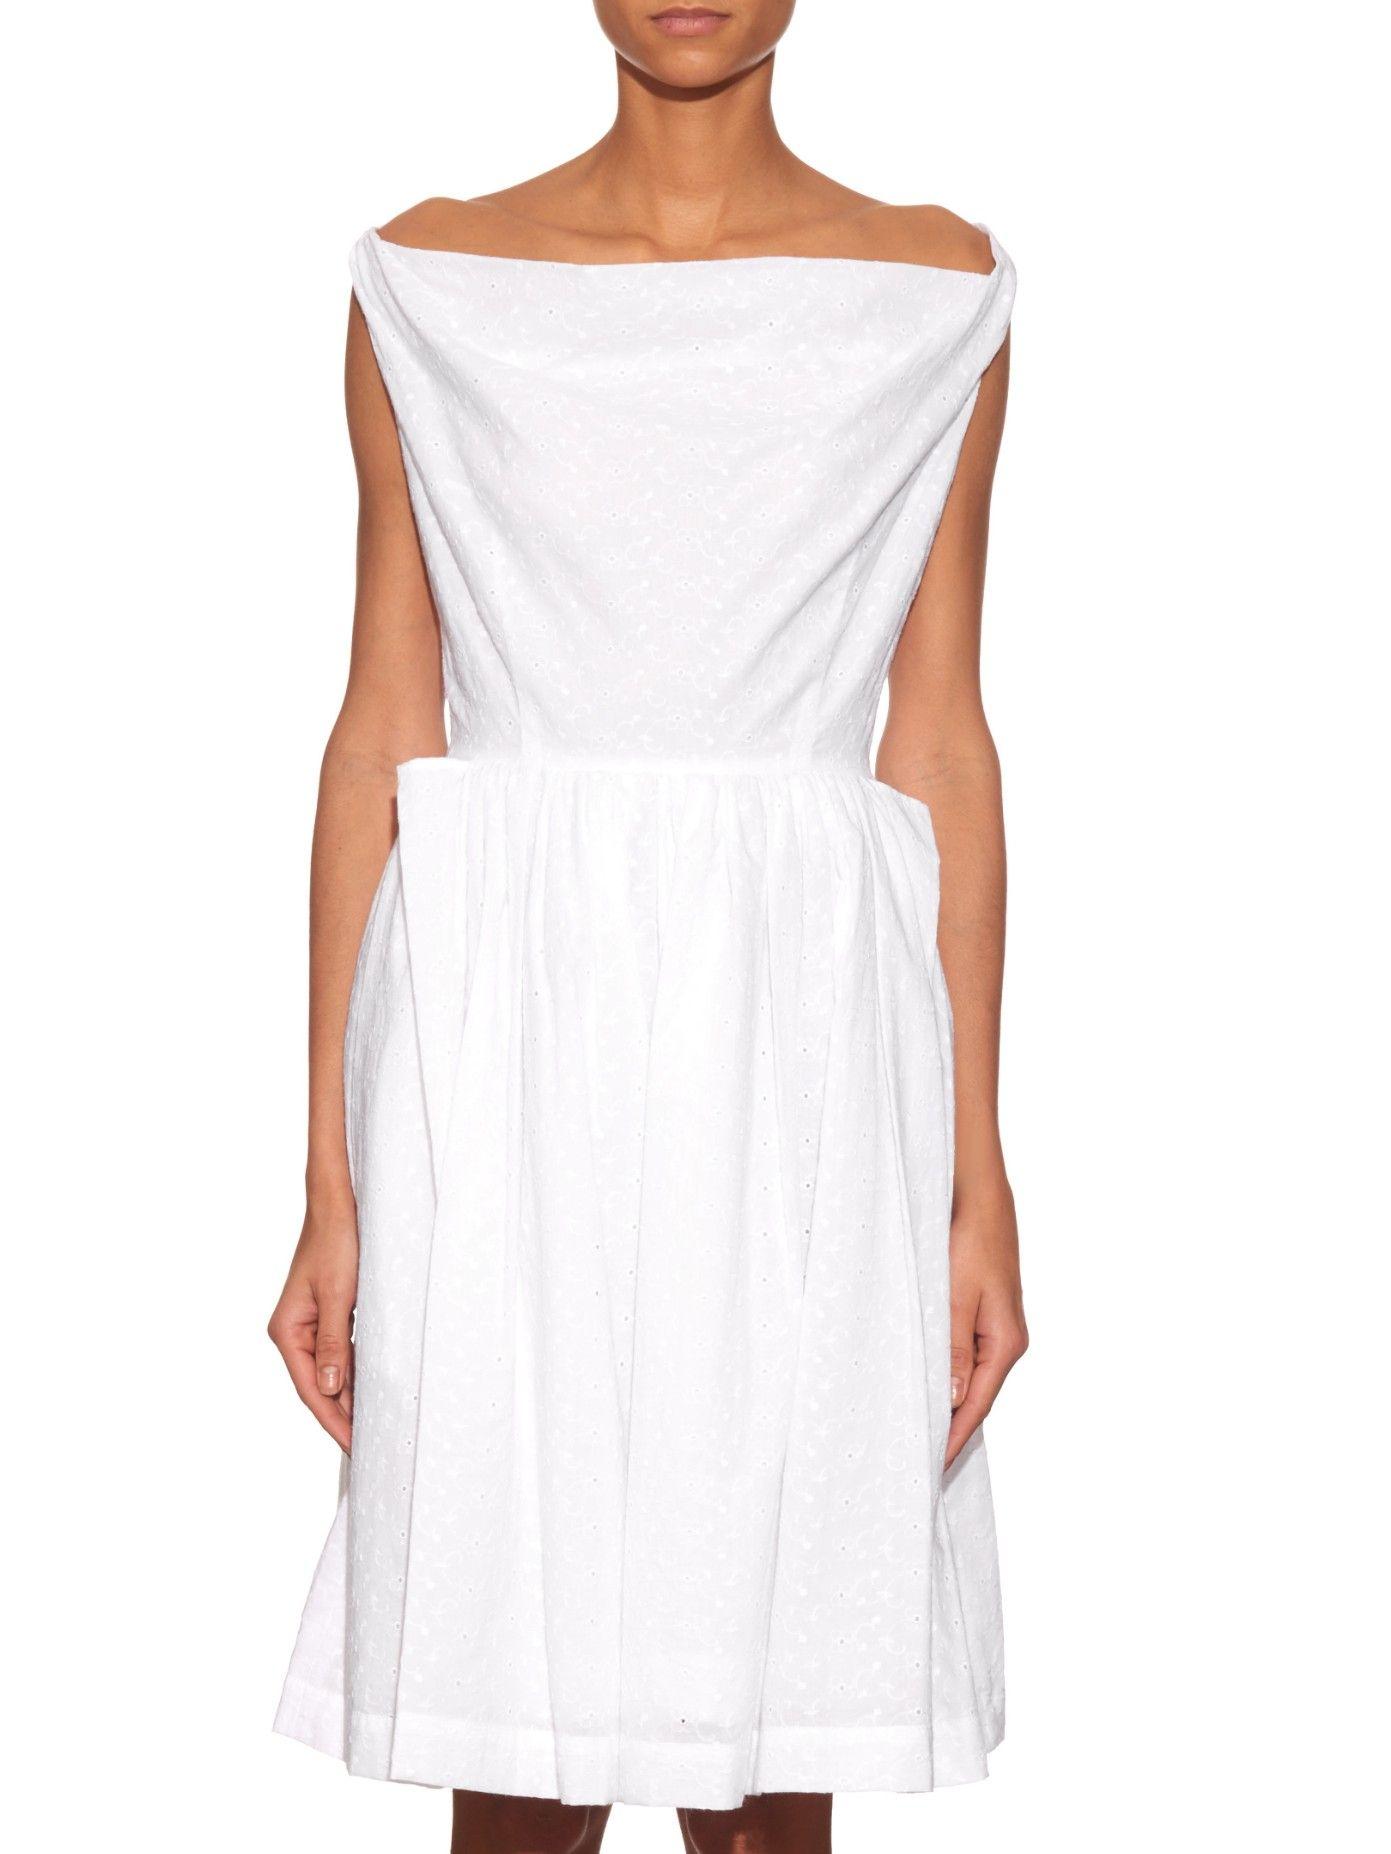 Broderie Anglaise Draped Cotton Dress Vivienne Westwood Anglomania Matchesfashion Com Us Dresses Cotton Dresses Vivienne Westwood Anglomania [ 1854 x 1391 Pixel ]